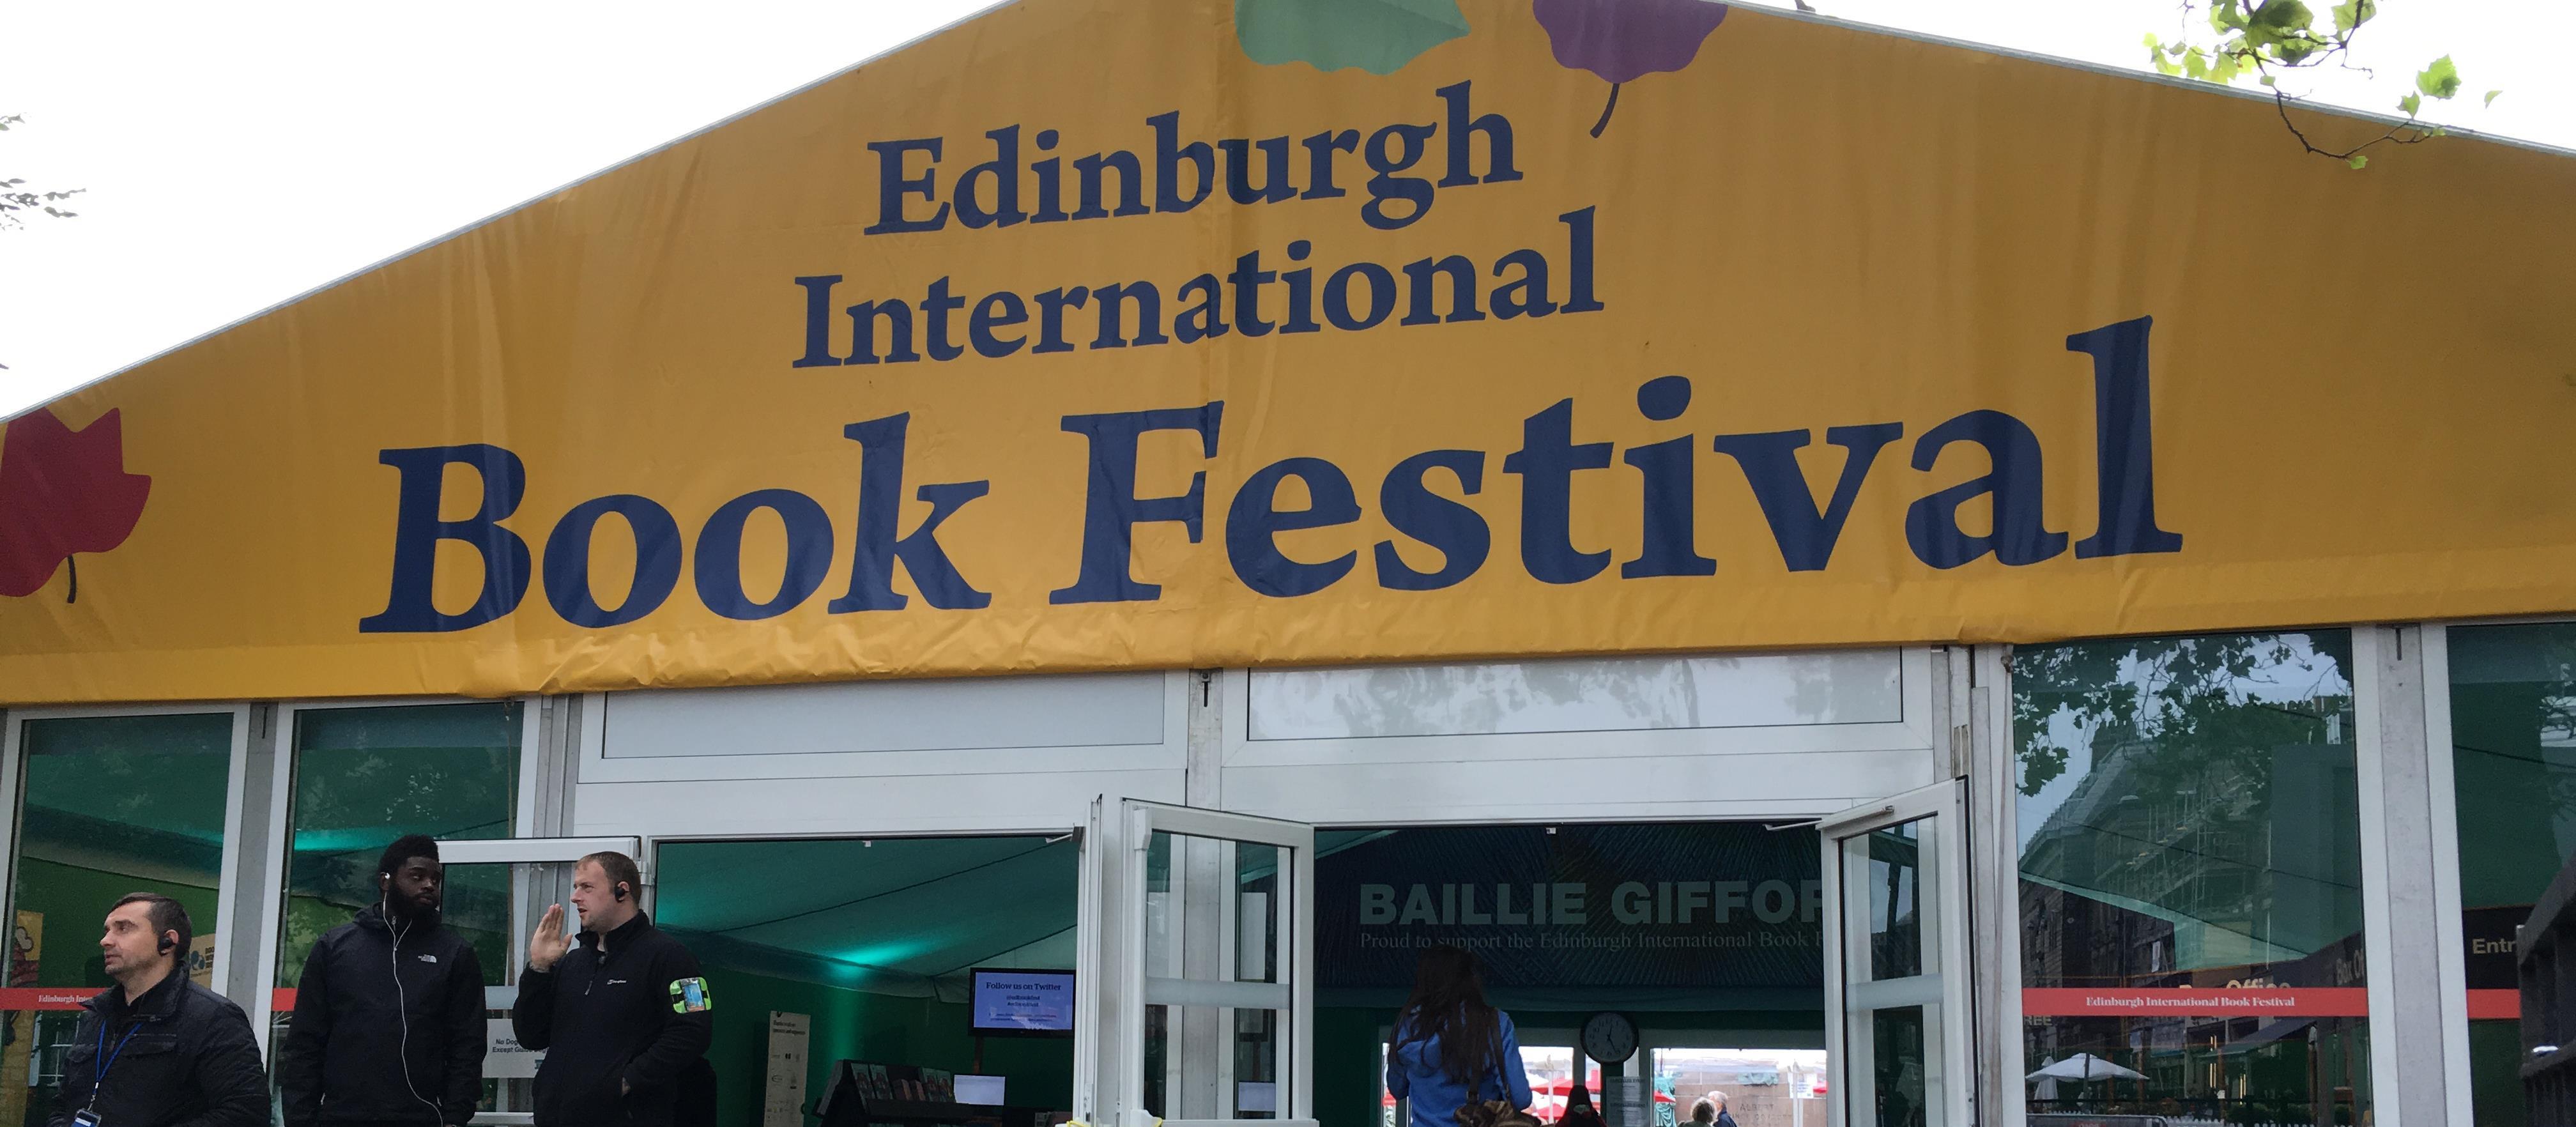 Photo of Edinburgh International Book Festival entrance.